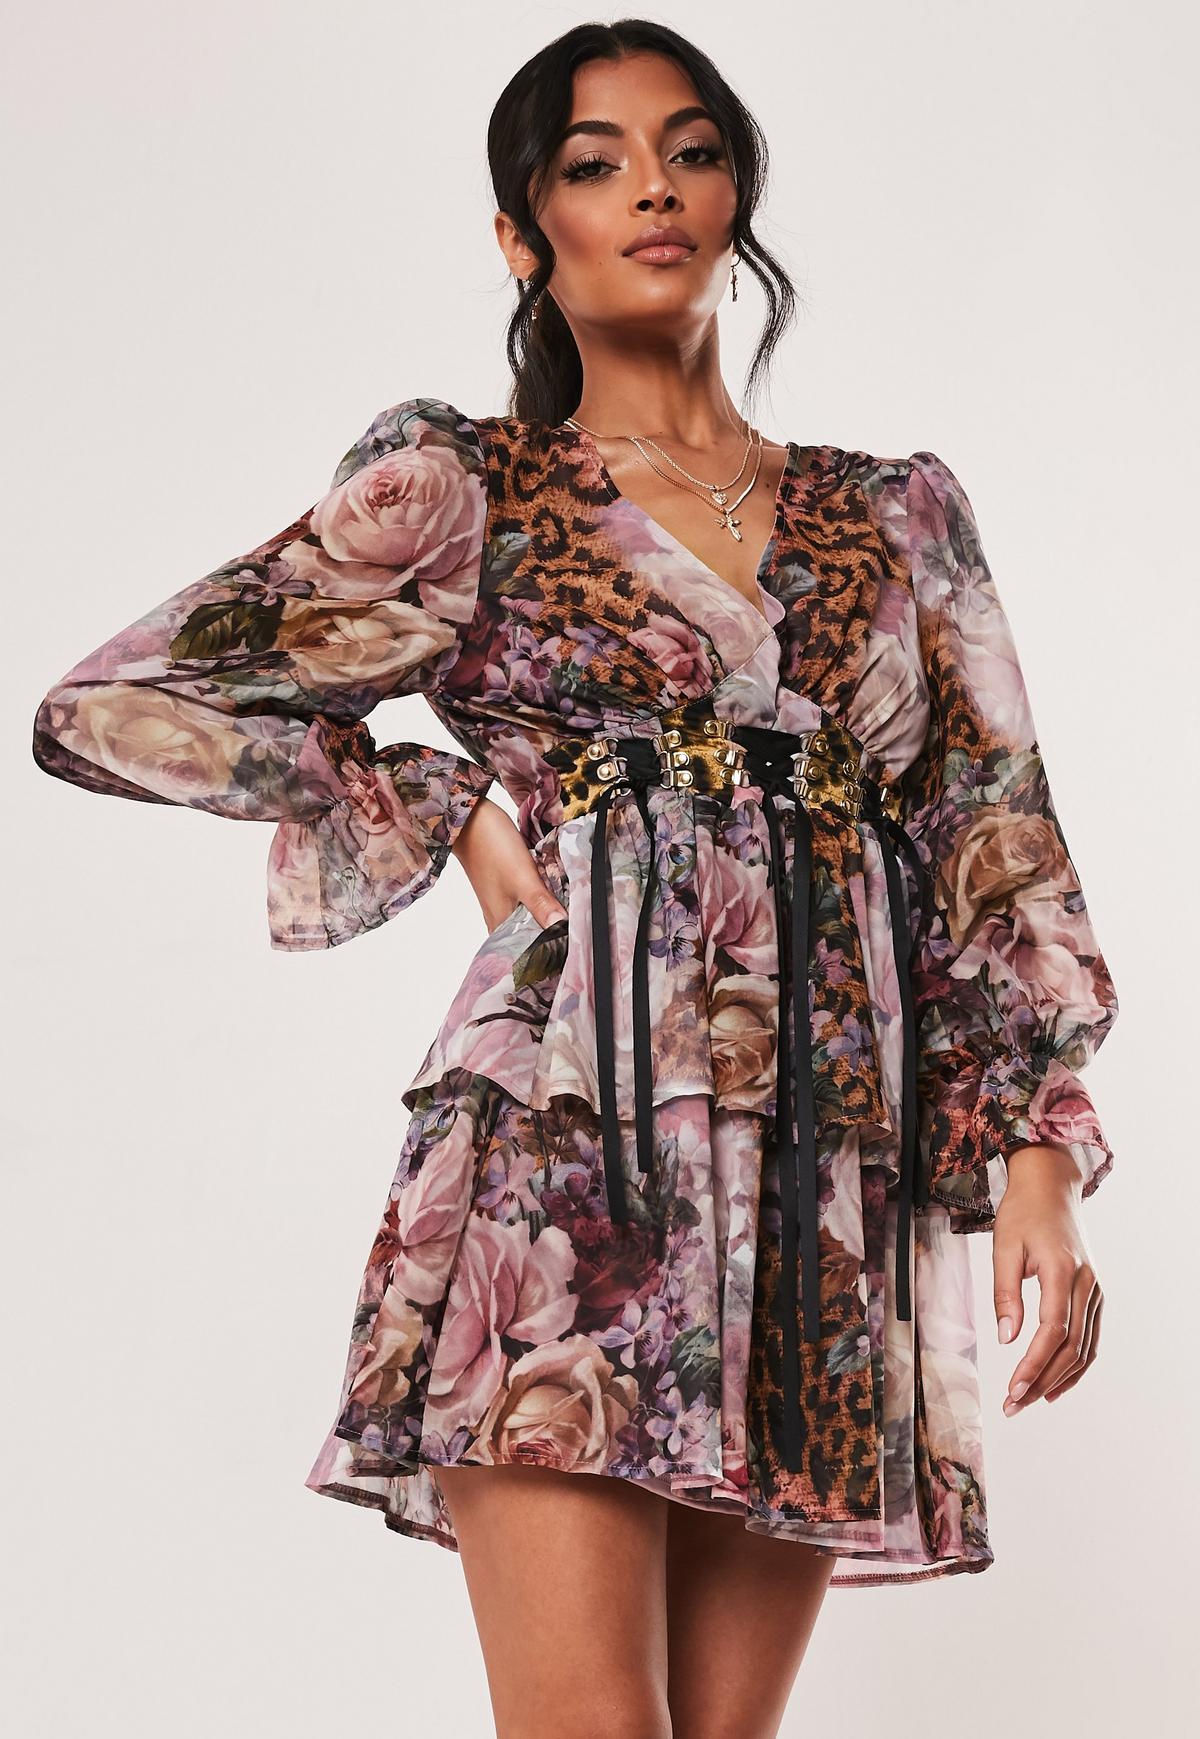 lowest discount outlet boutique sale Pink Floral Leopard Print Tiered Corset Dress | Missguided